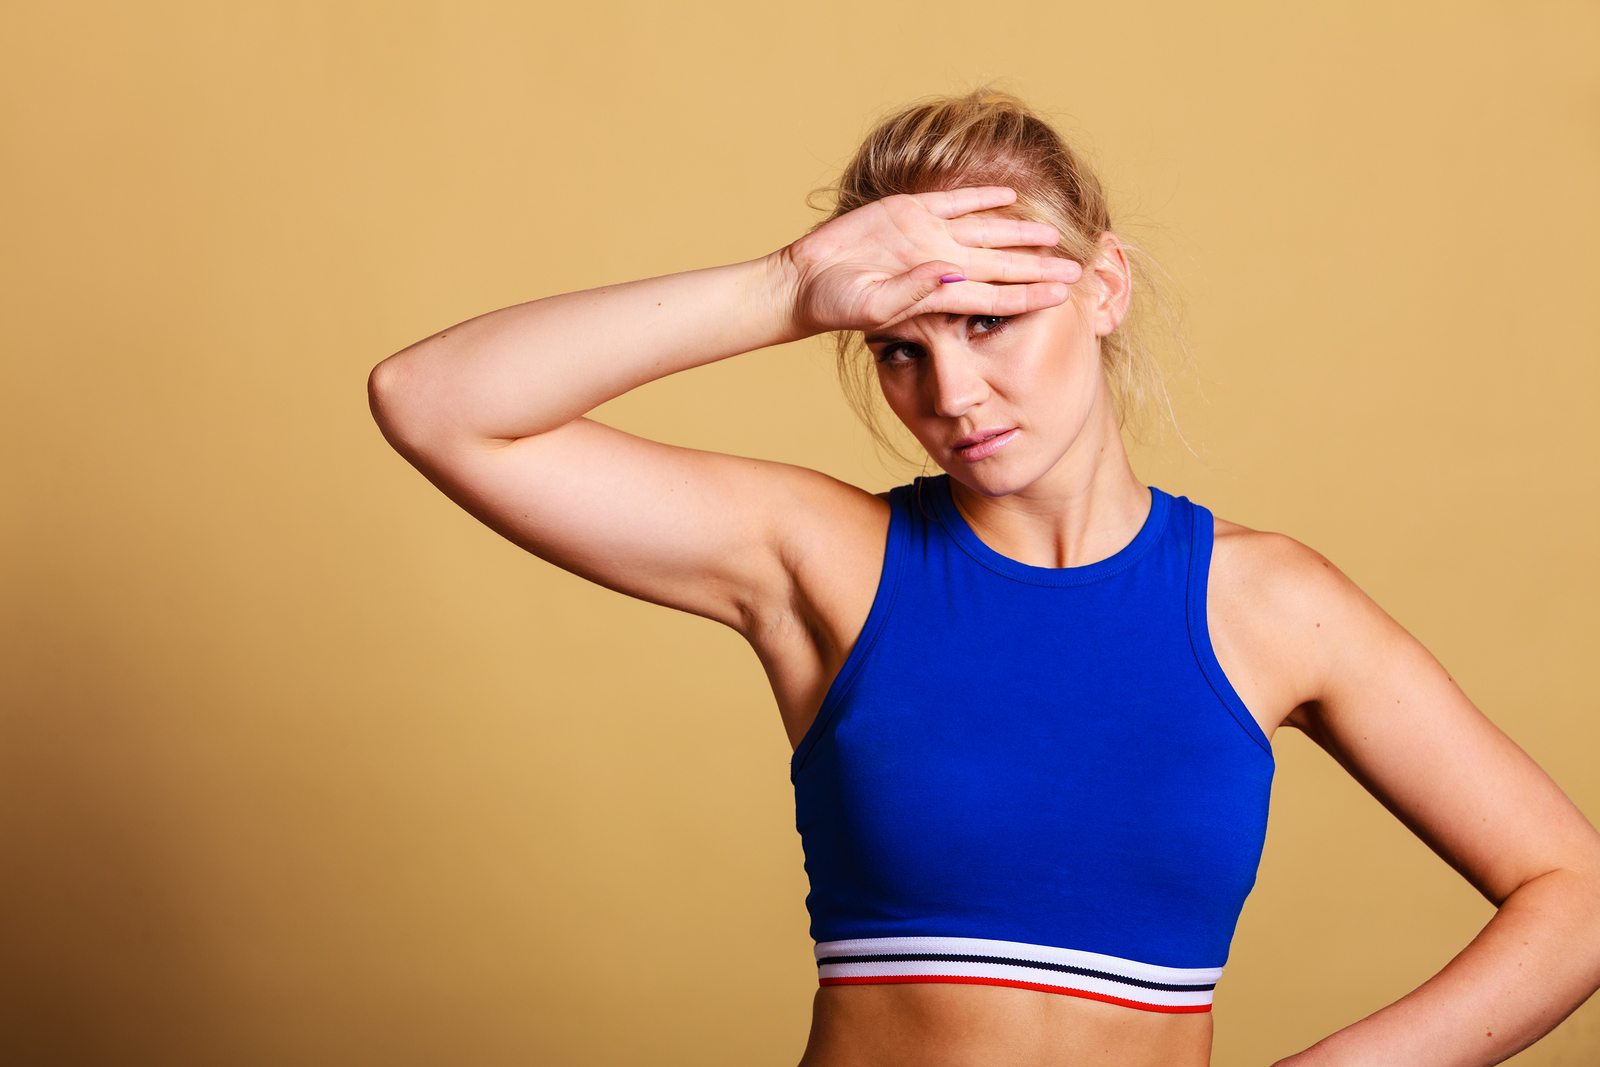 Burnout E Treinamento Excessivo Academia Do Psicólogo